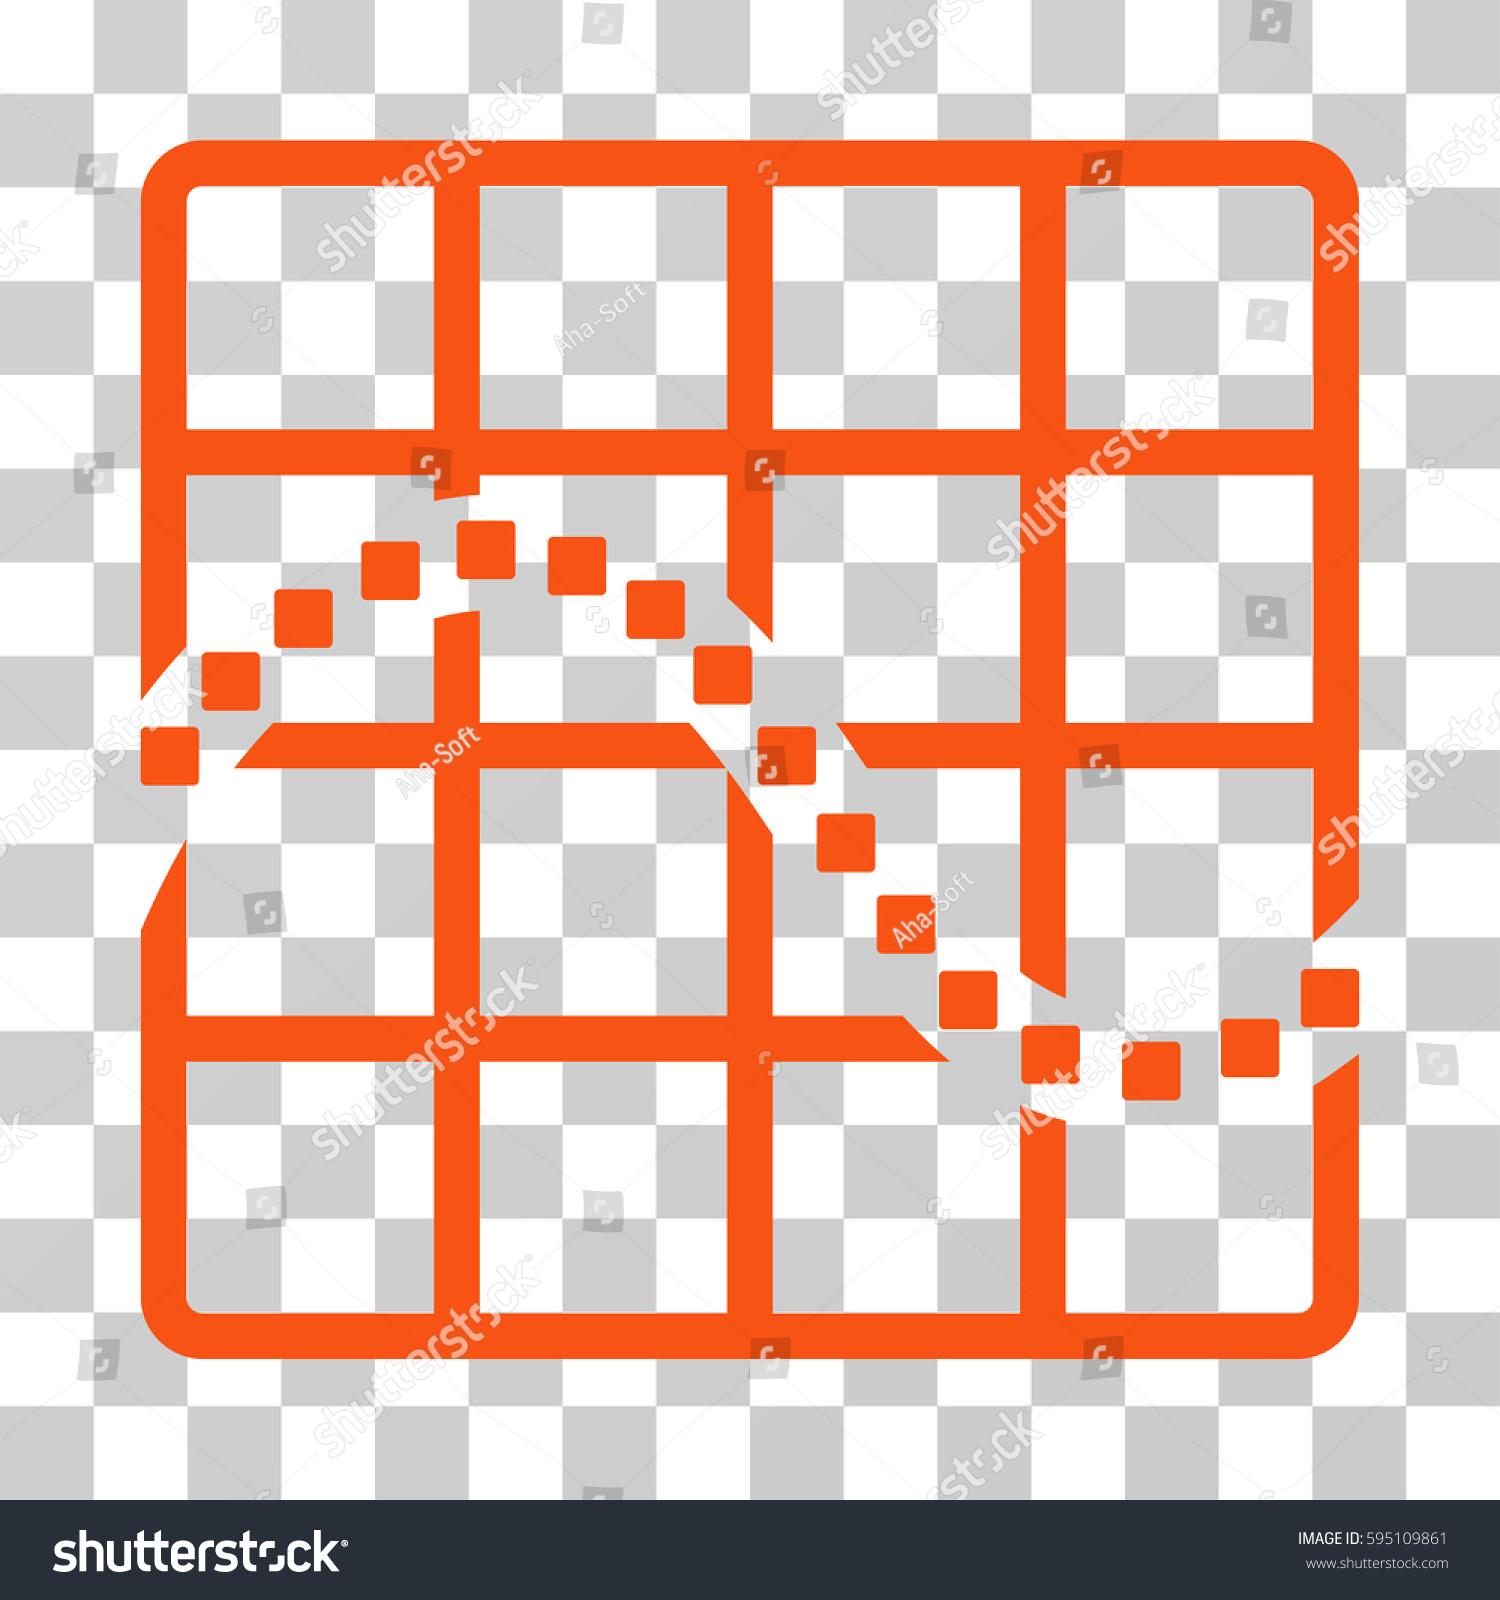 Kihei tide chart images free any chart examples kihei tide chart image collections free any chart examples kihei tide chart gallery free any chart nvjuhfo Images